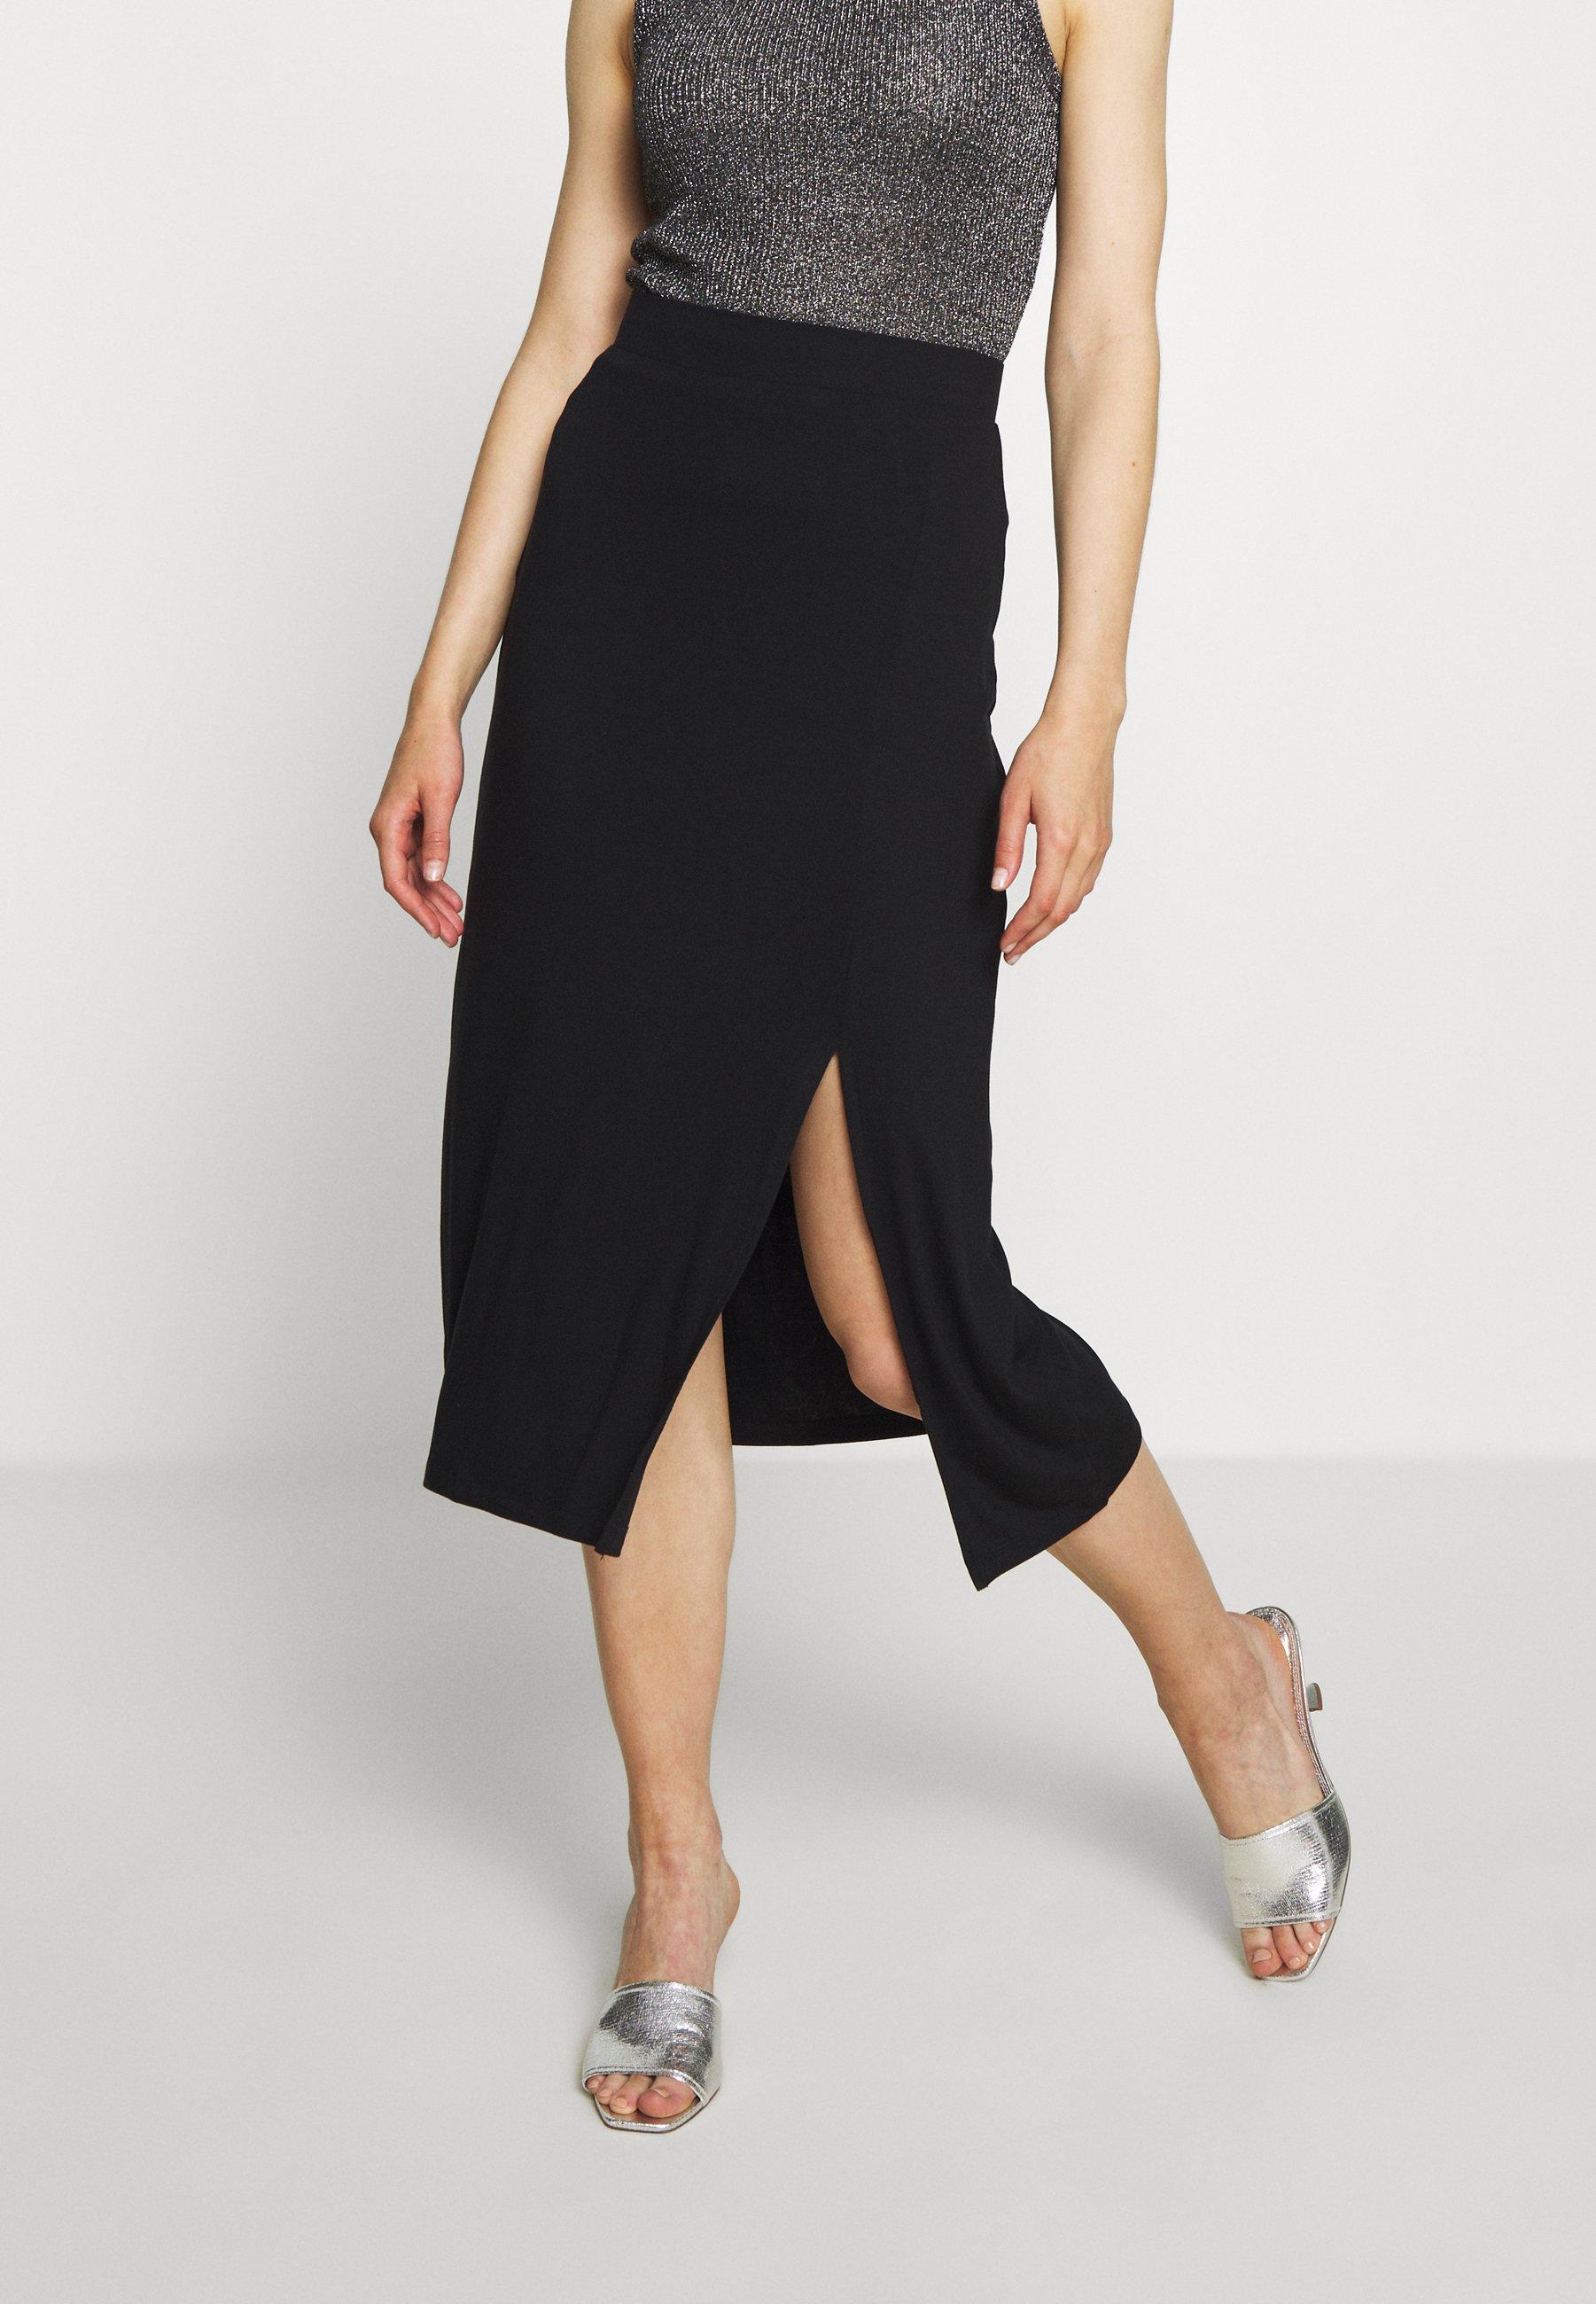 Femme Midi high slit high waisted skirt - Jupe crayon